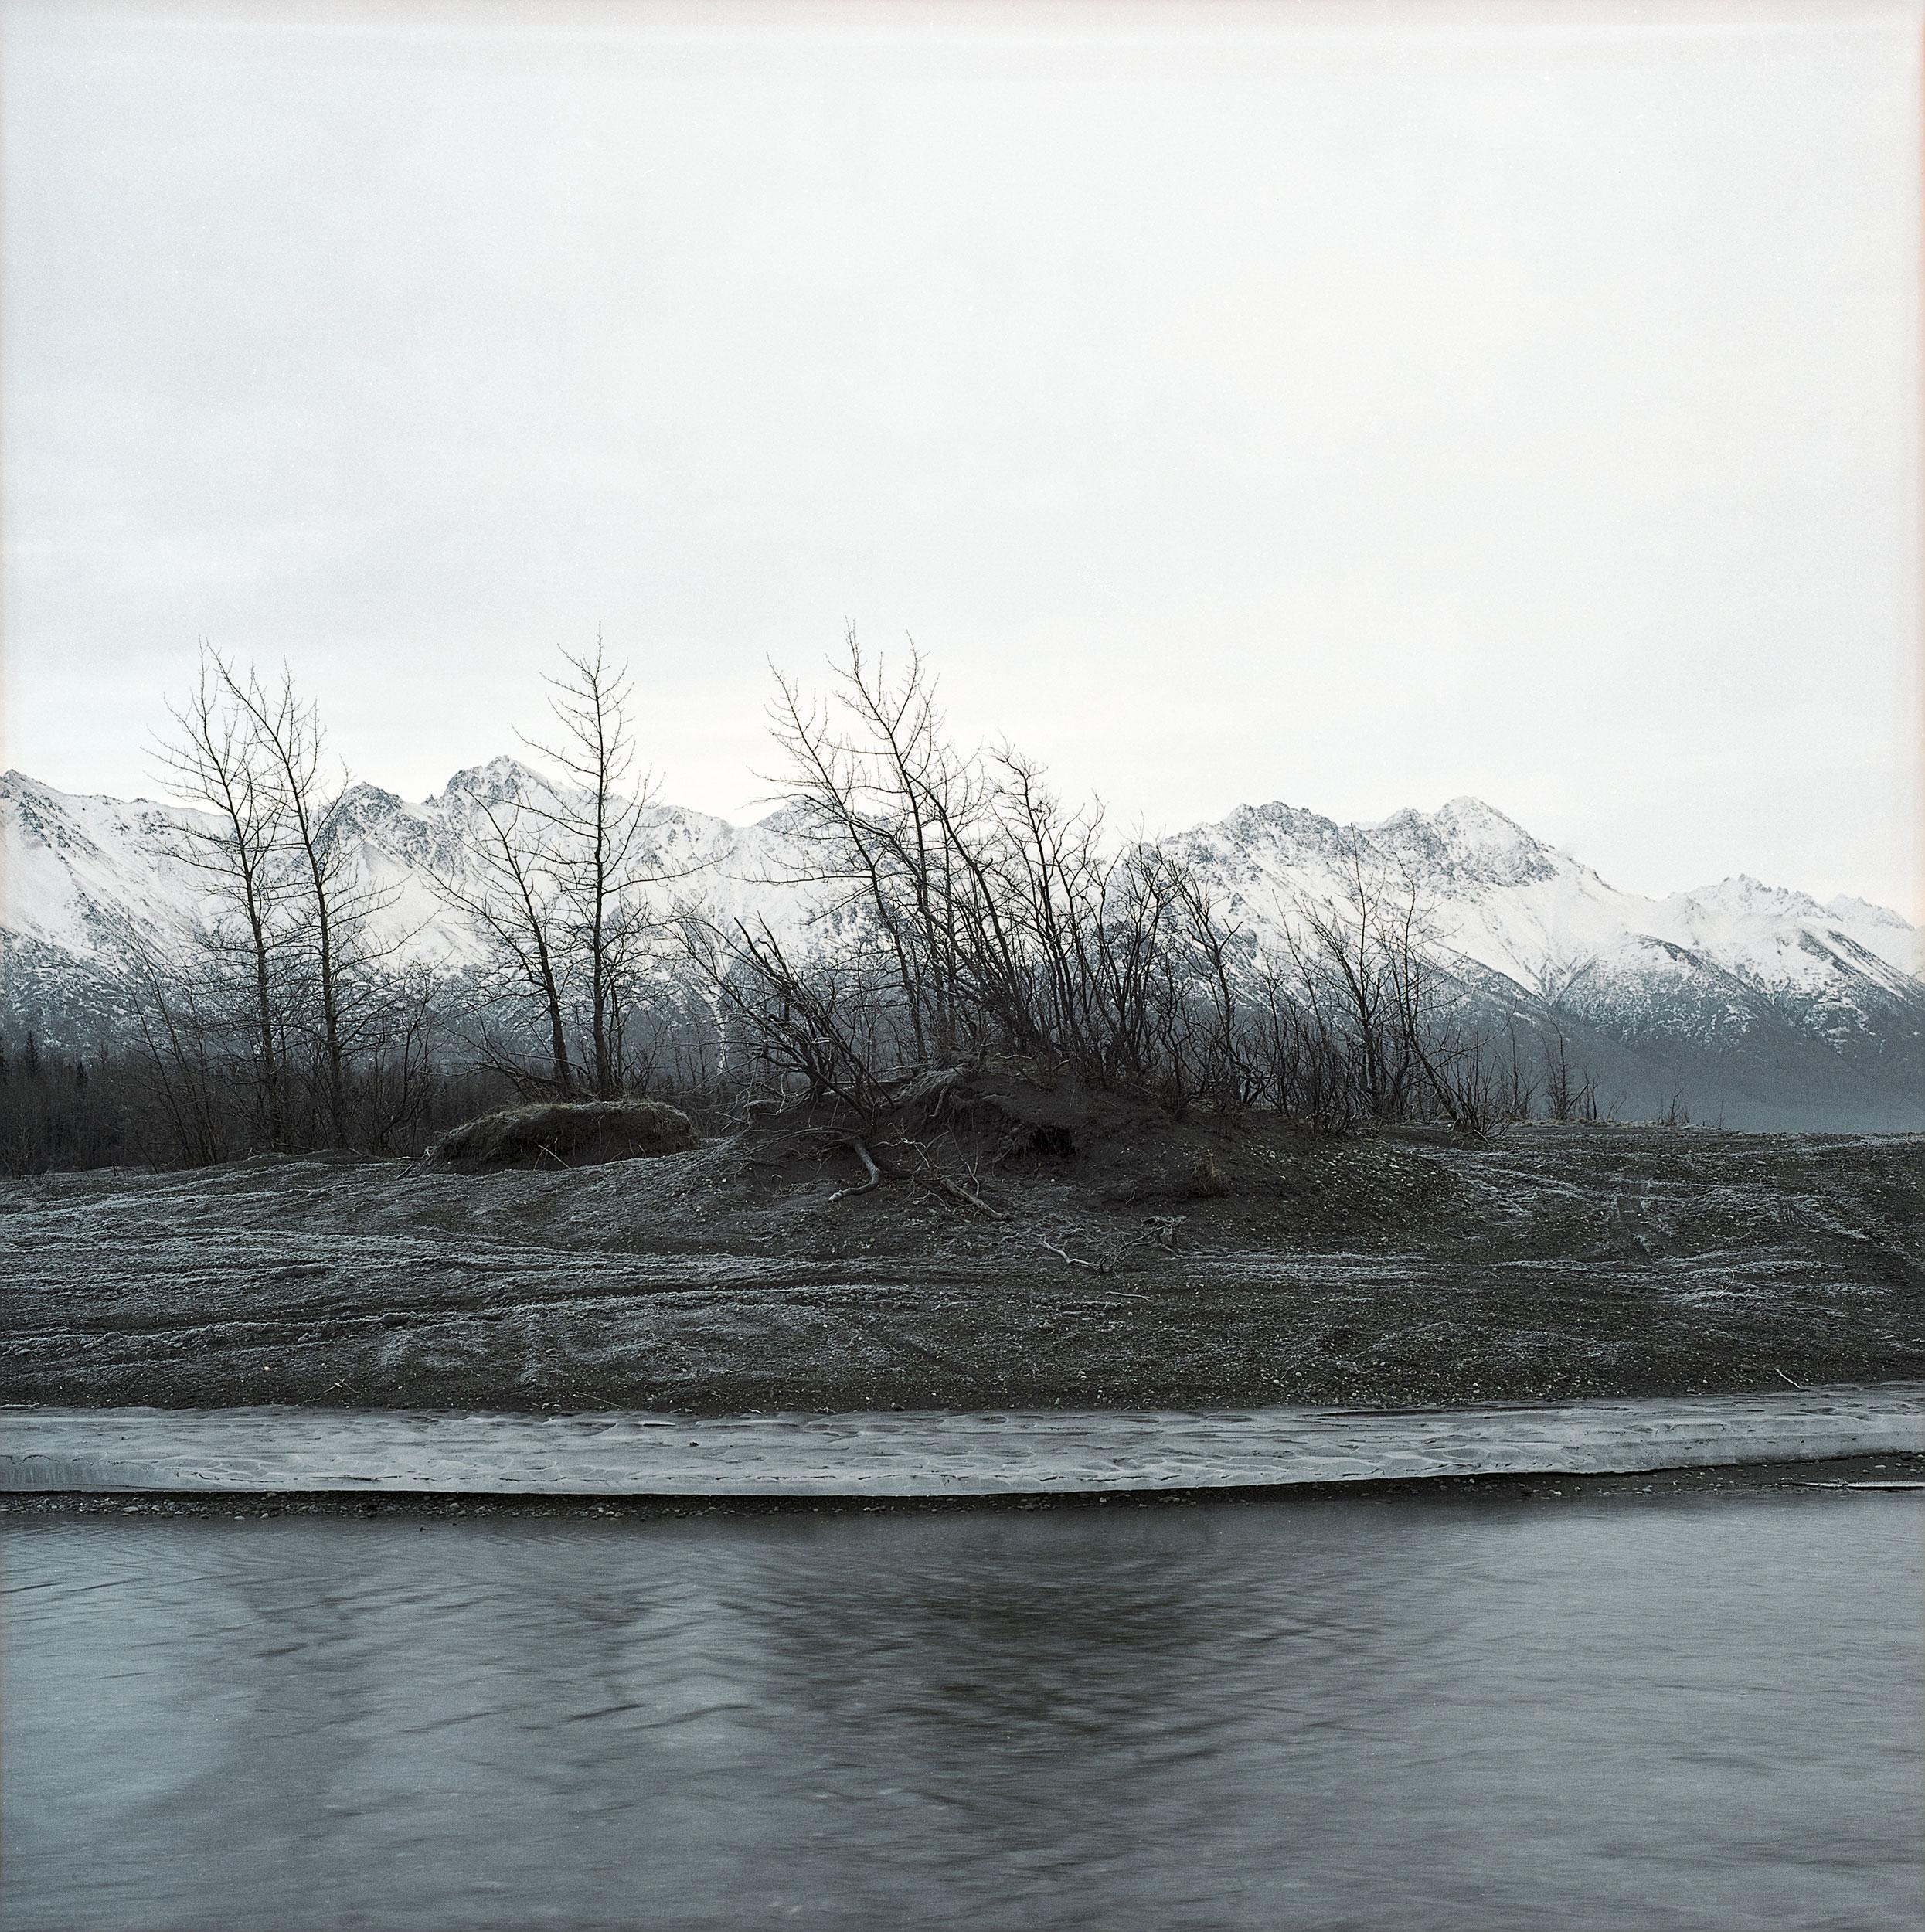 Knik River Alaska